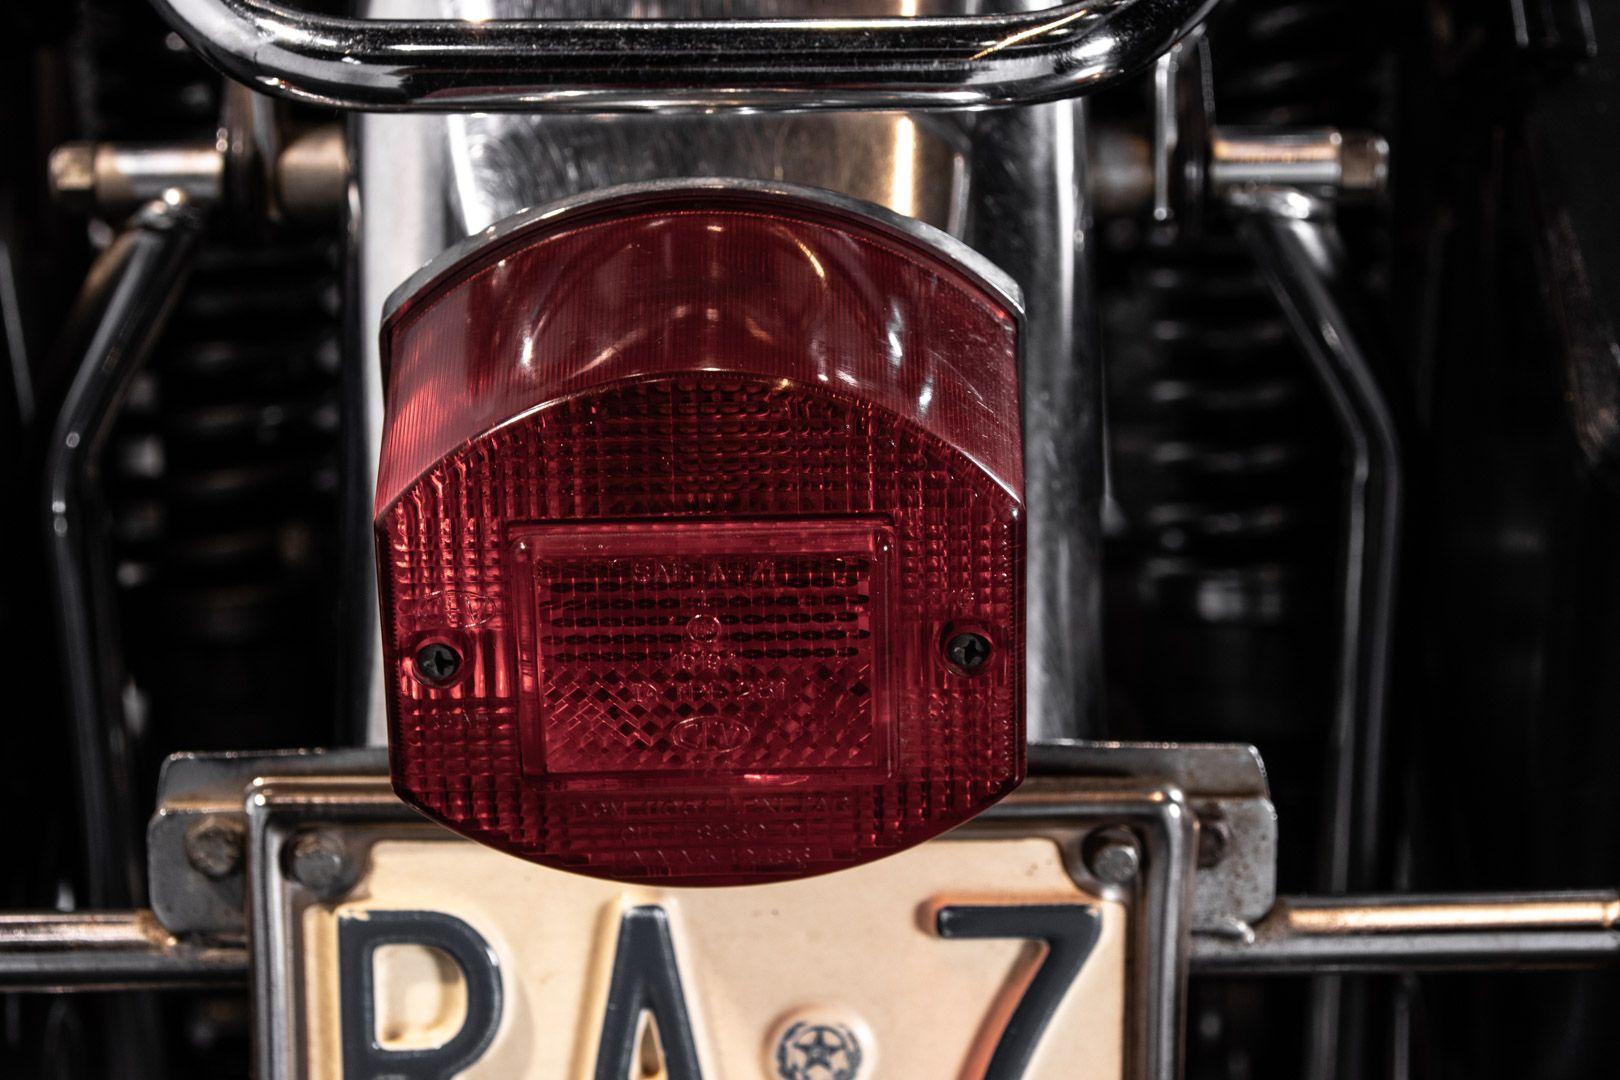 1981 Moto Guzzi 850 T3 California 83274